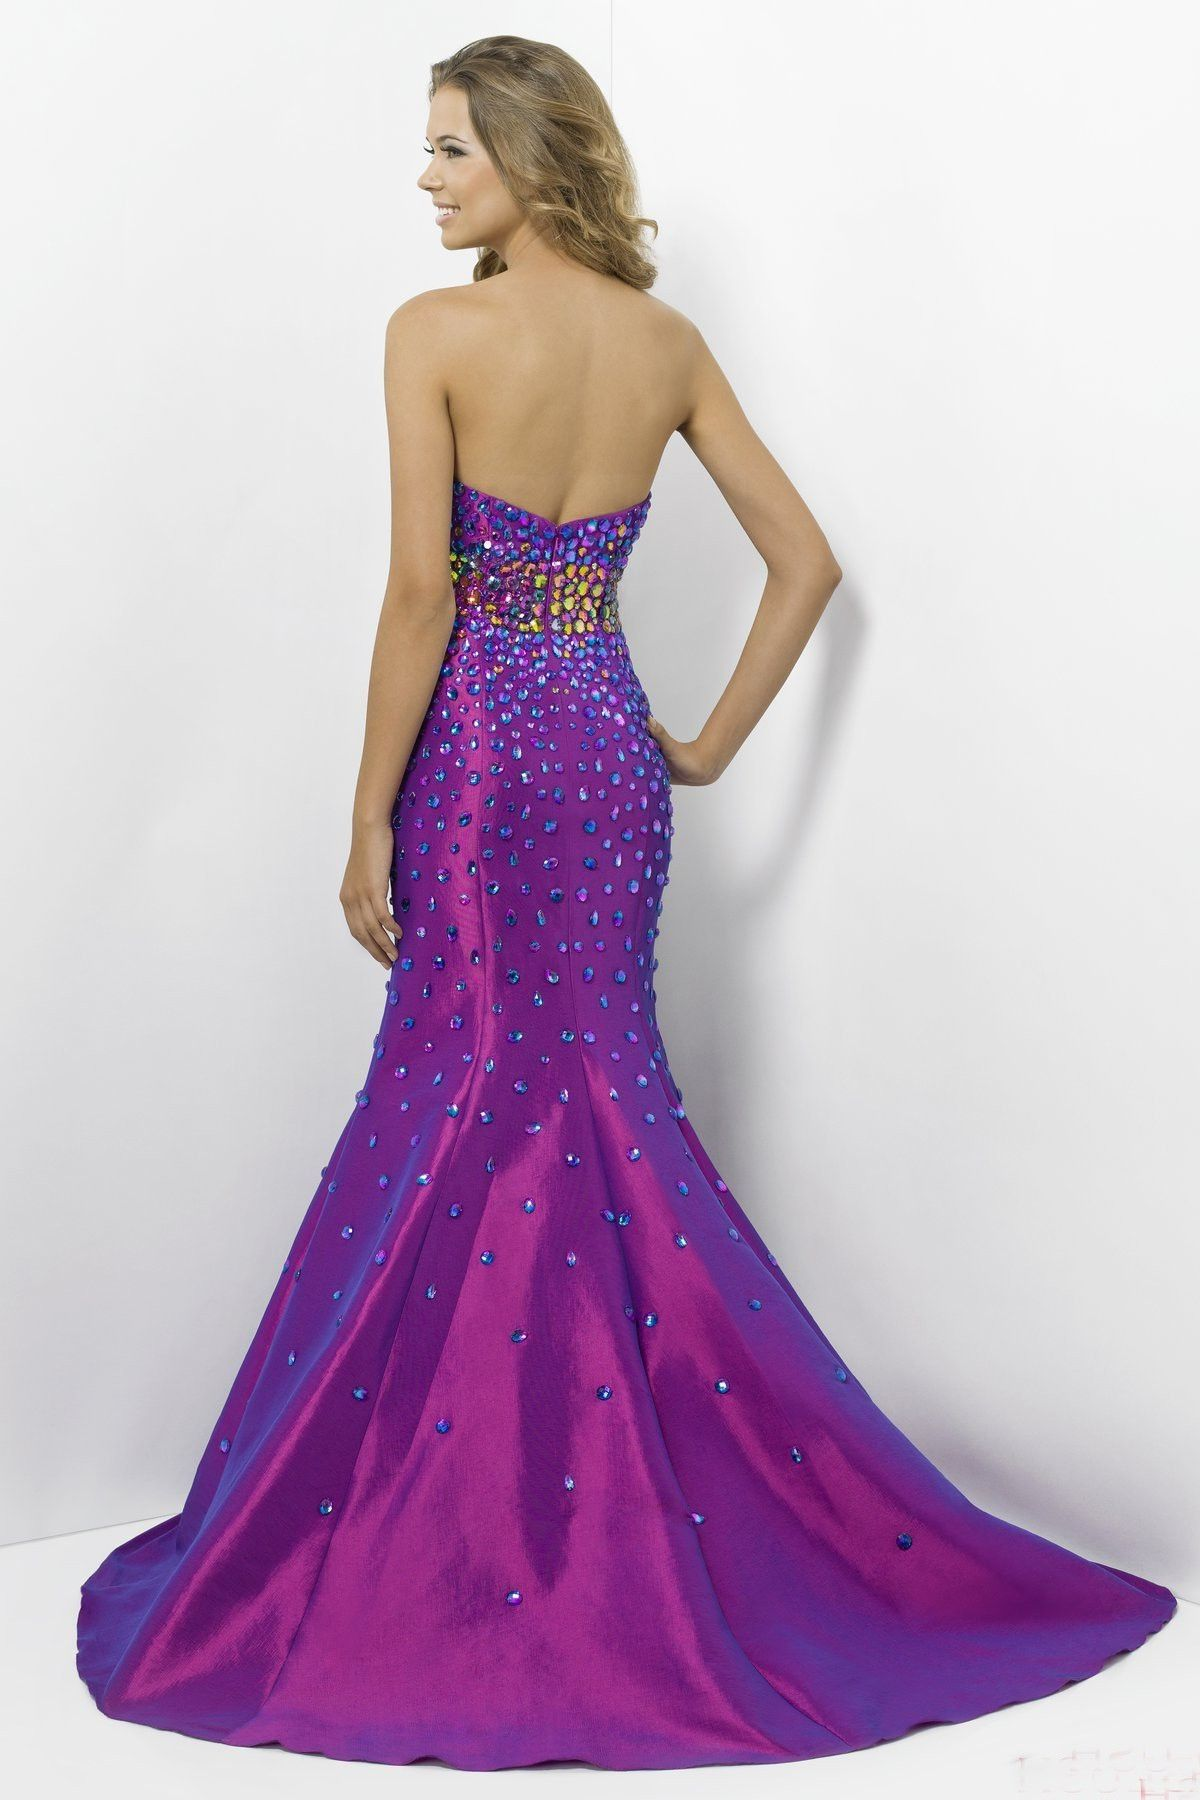 Taffeta mermaid sweetheart long prom dress with dimondpd